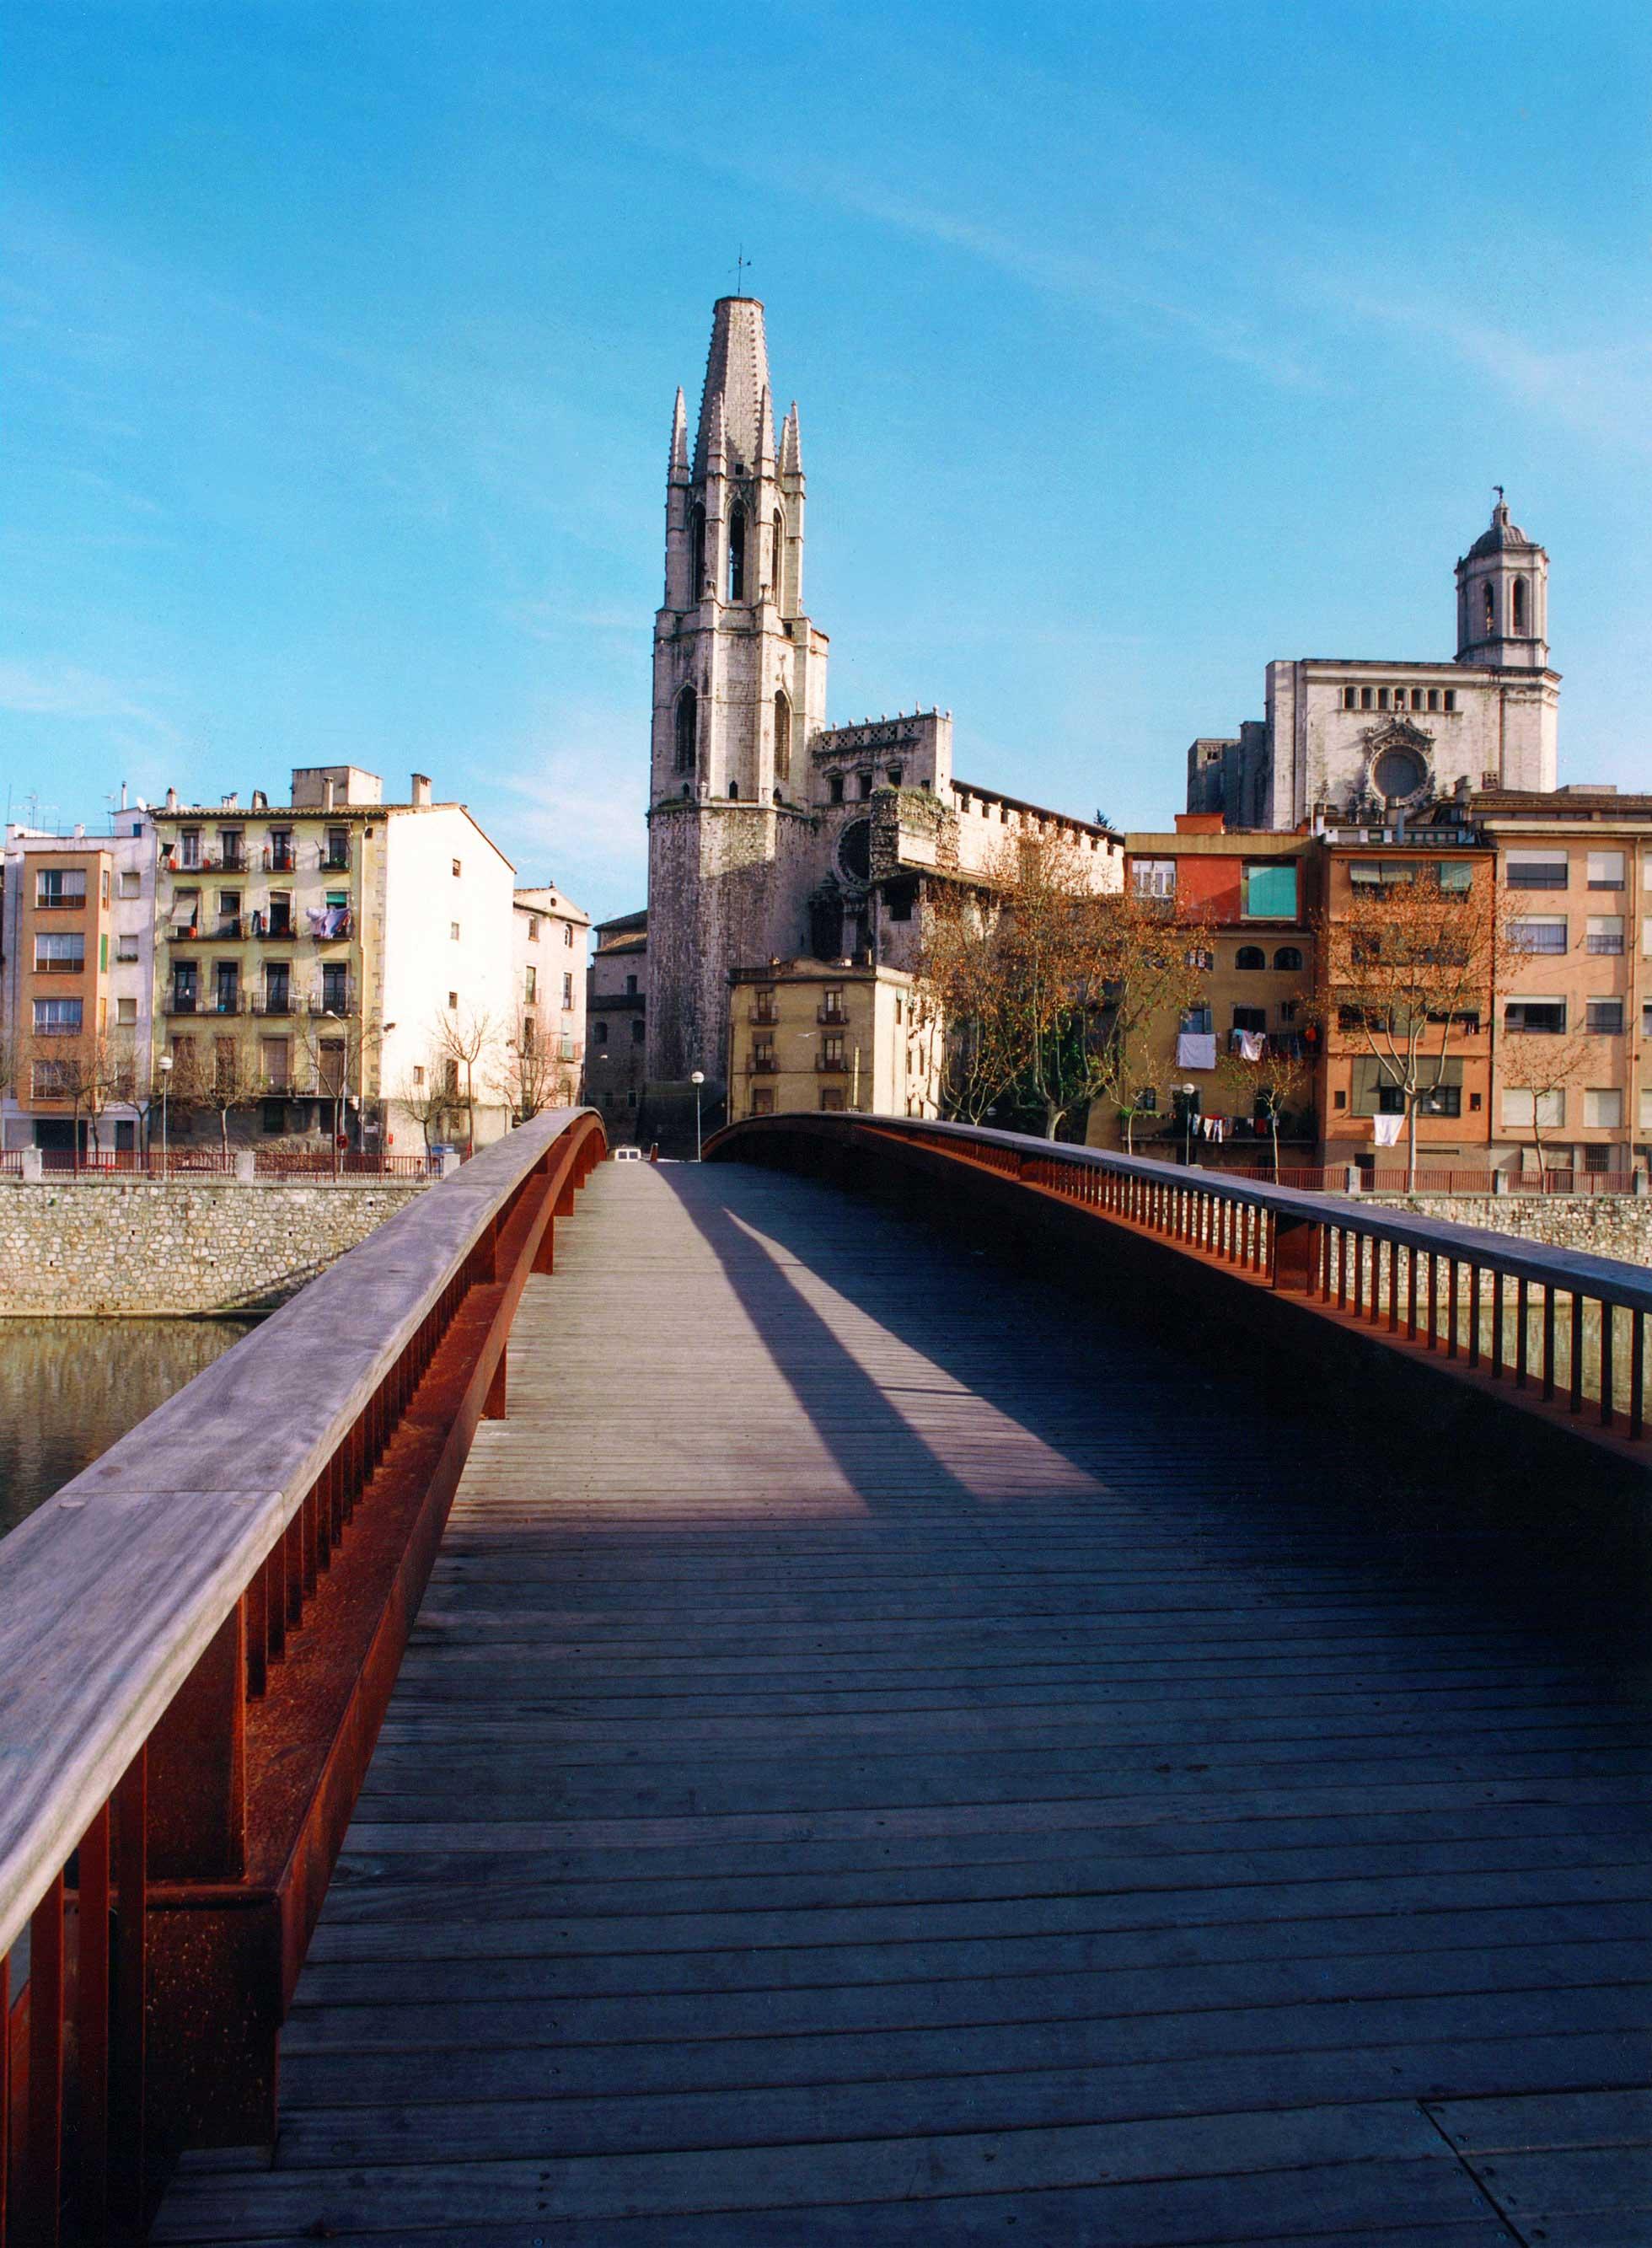 Pasarela Sant Feliu, Girona 1